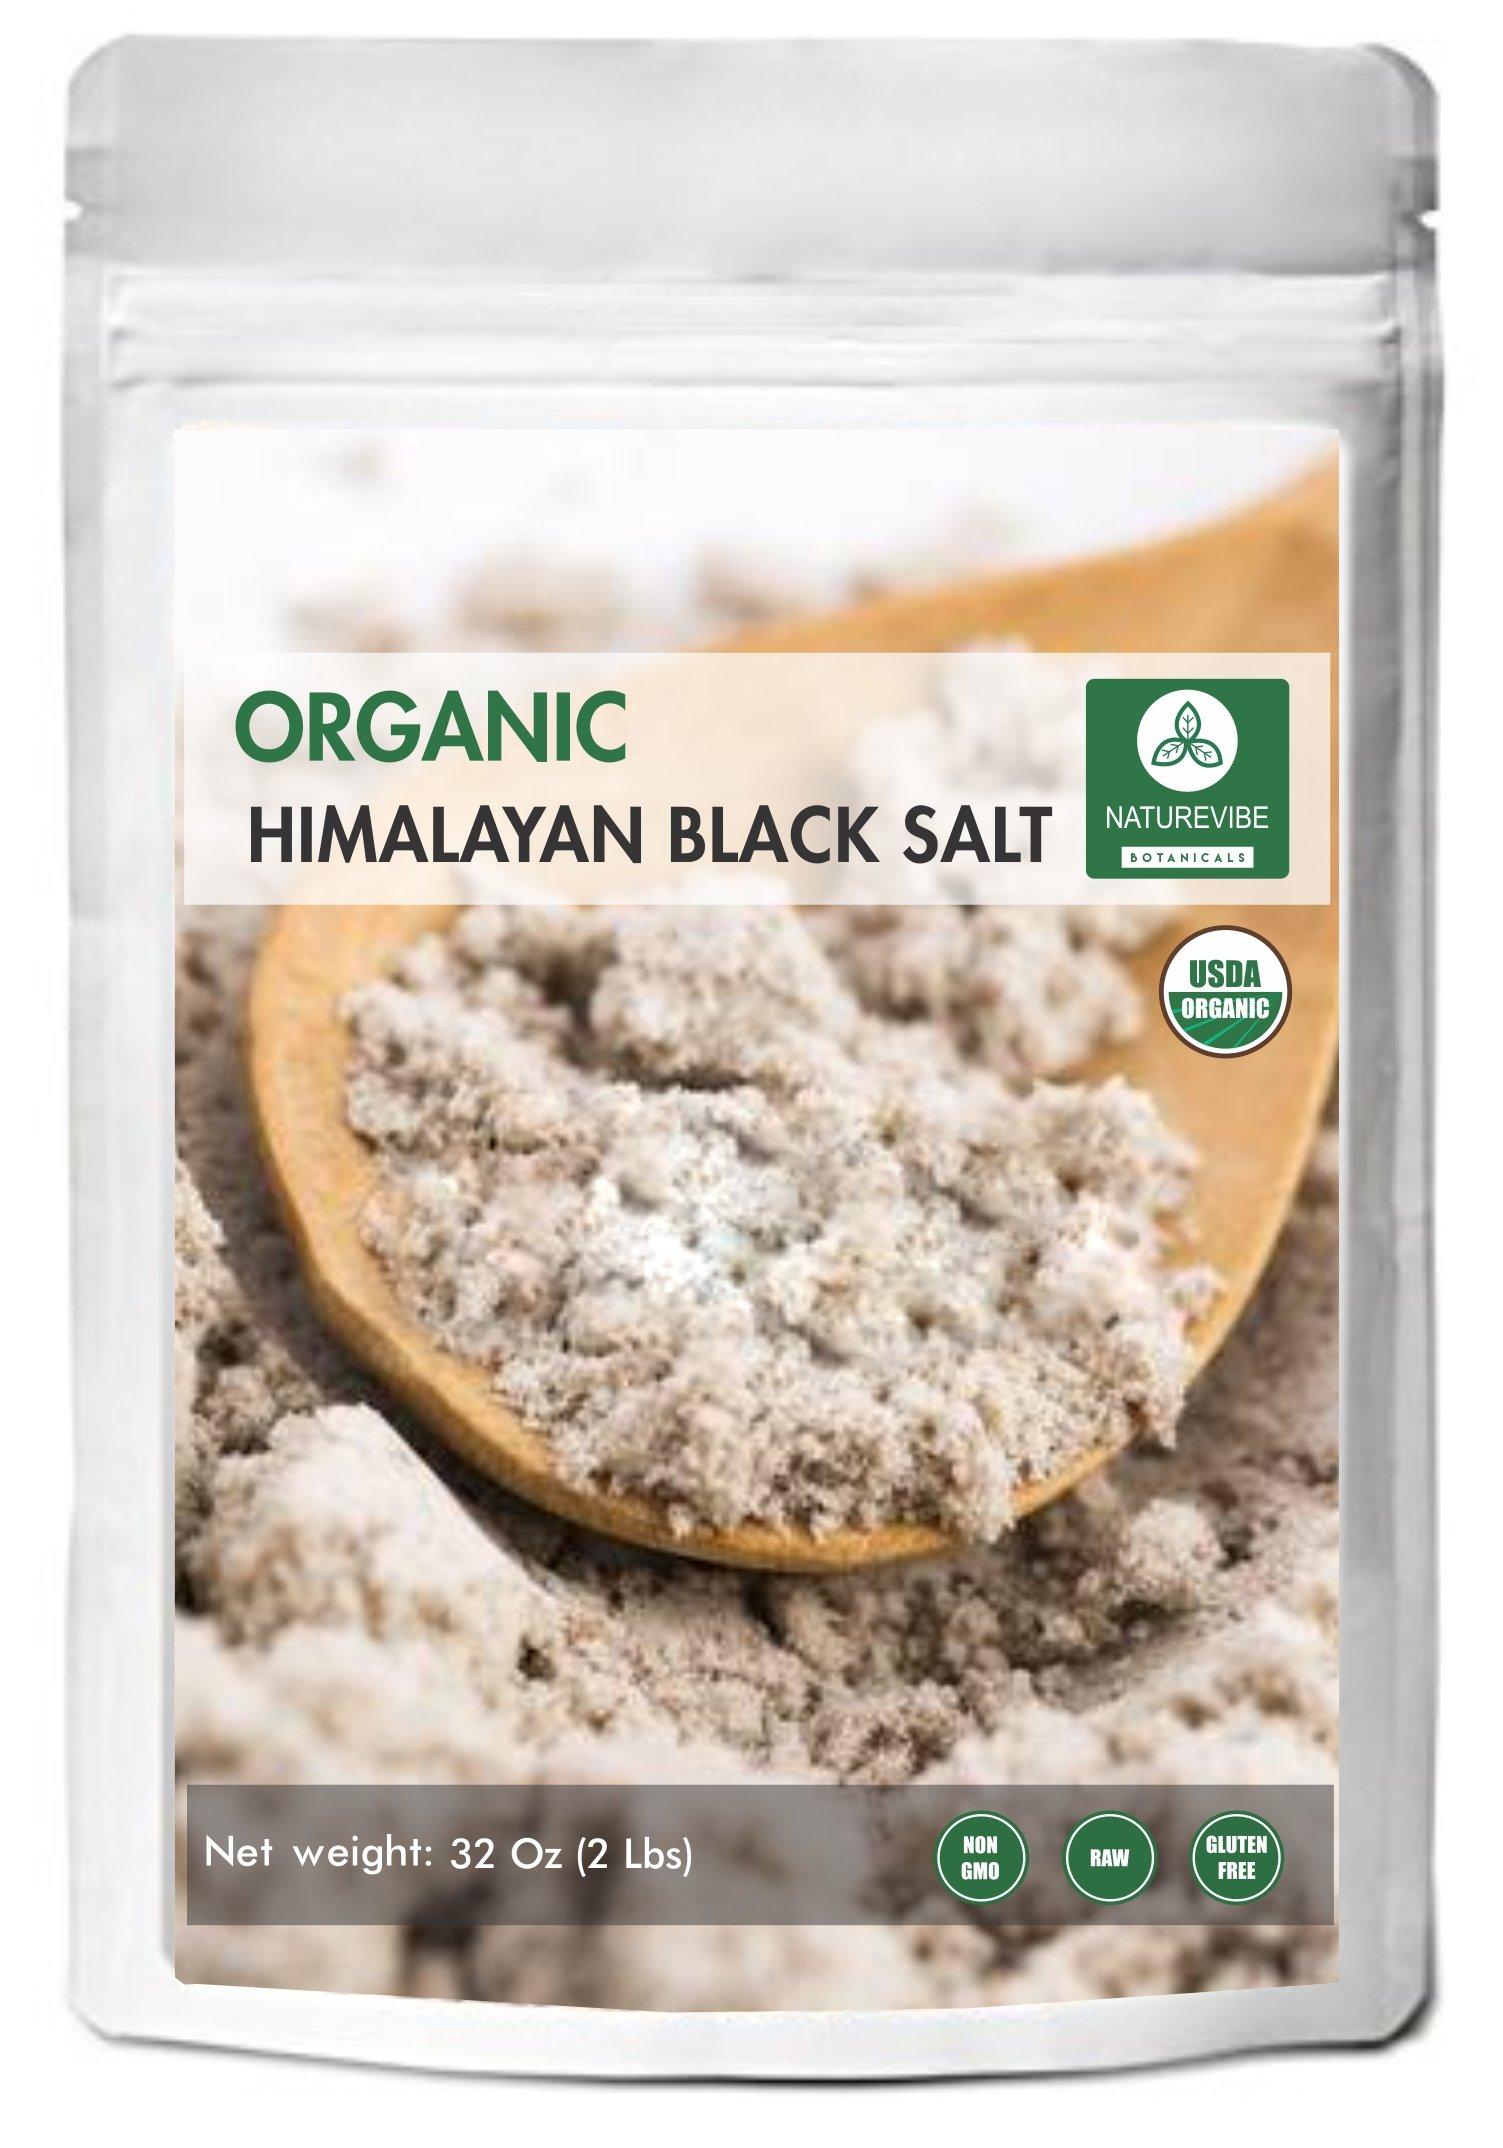 100% Natural & Healthy Himalayan Black Salt (2lb) by Naturevibe Botanicals, Gluten-Free & Non-GMO (32 ounces) (Fine - Cooking Size) by Naturevibe Botanicals